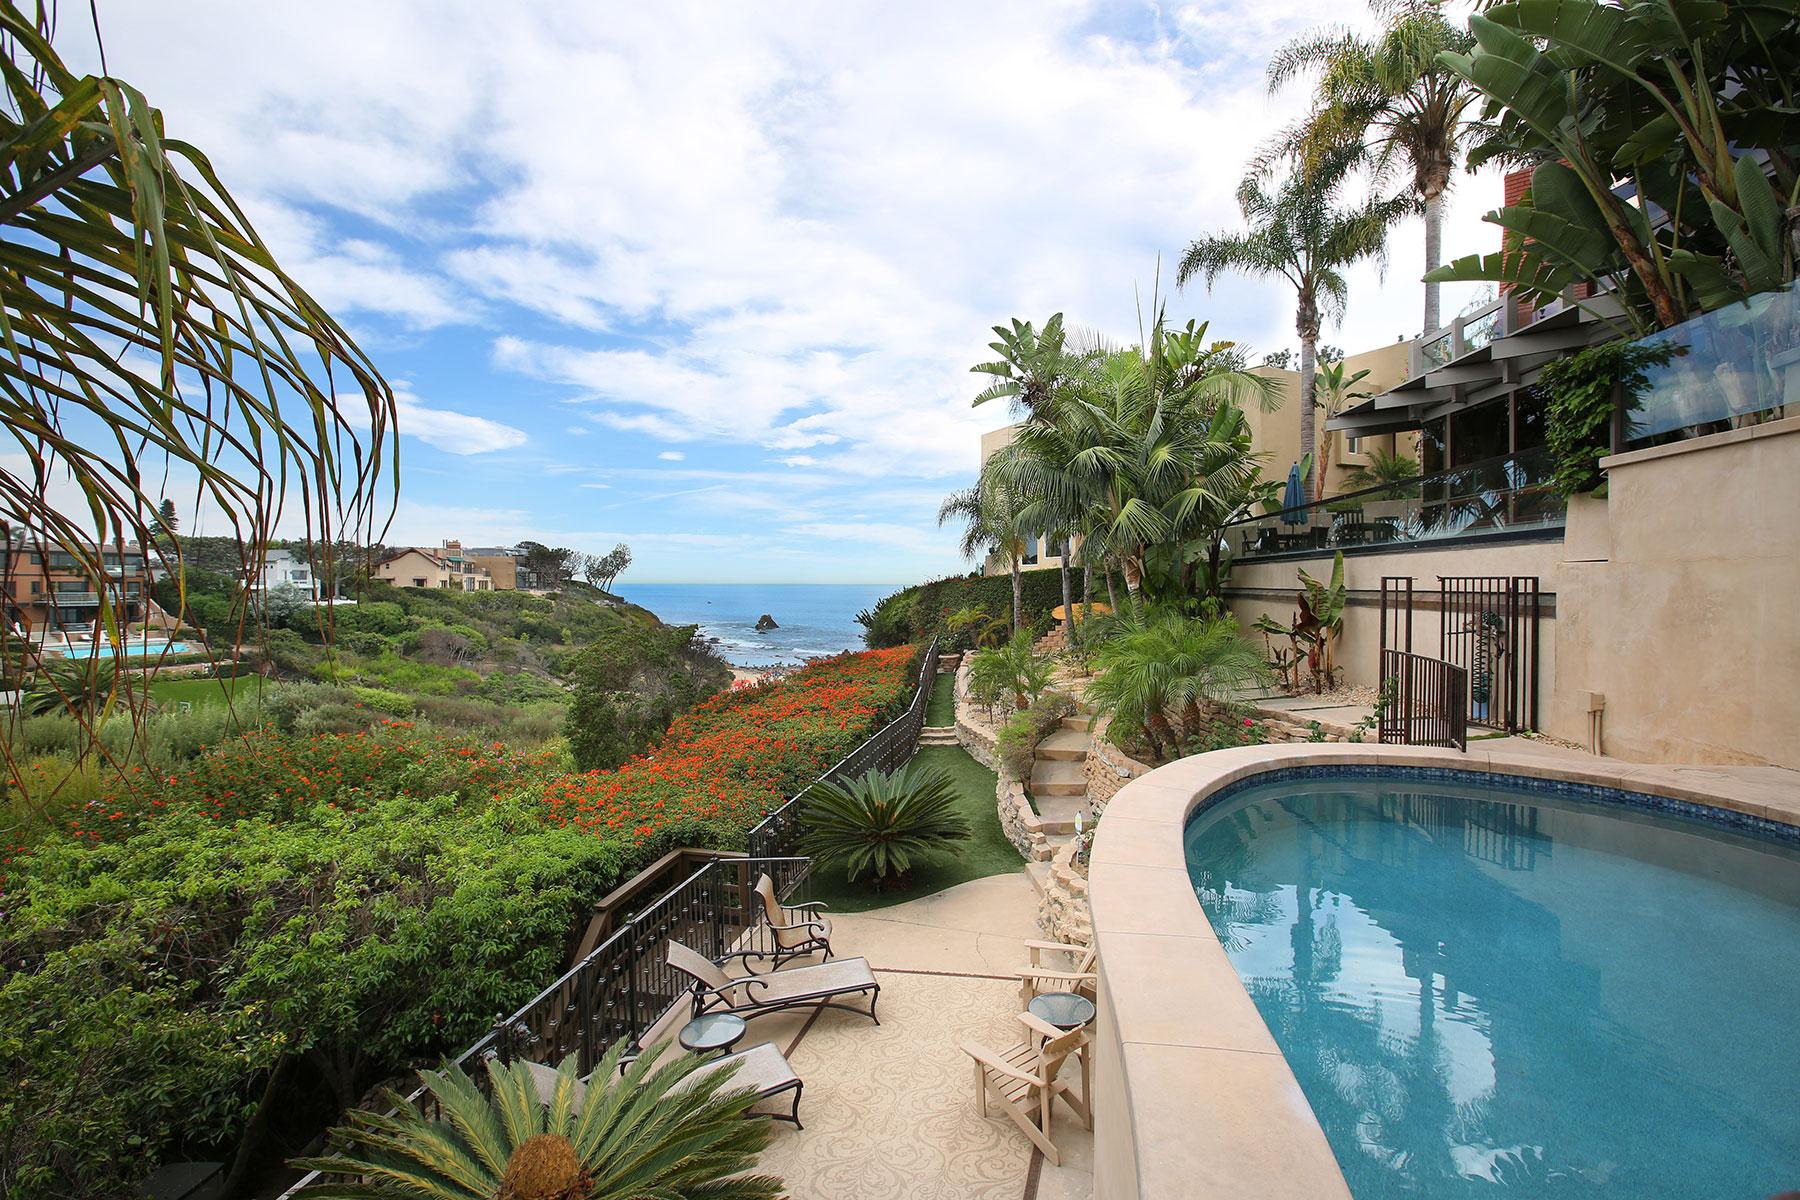 Moradia para Venda às Idyllic Seaside Living 218 Hazel Drive Corona Del Mar, Califórnia, 92625 Estados Unidos